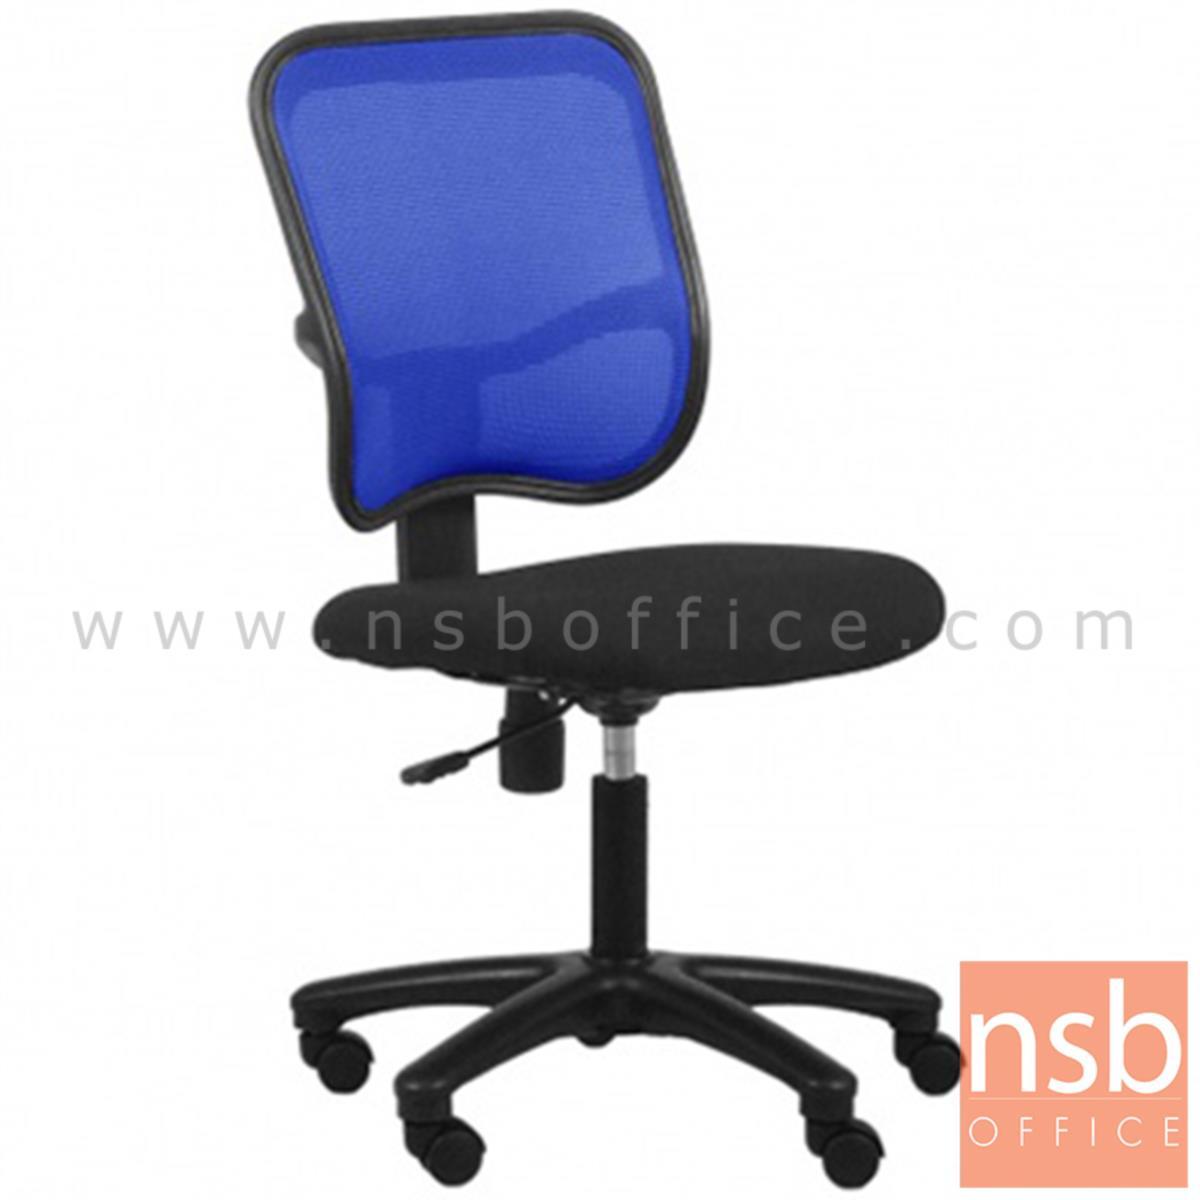 B33A004:เก้าอี้สำนักงานหลังเน็ต รุ่น SKY  โช๊คแก๊ส มีก้อนโยก ขาพลาสติก